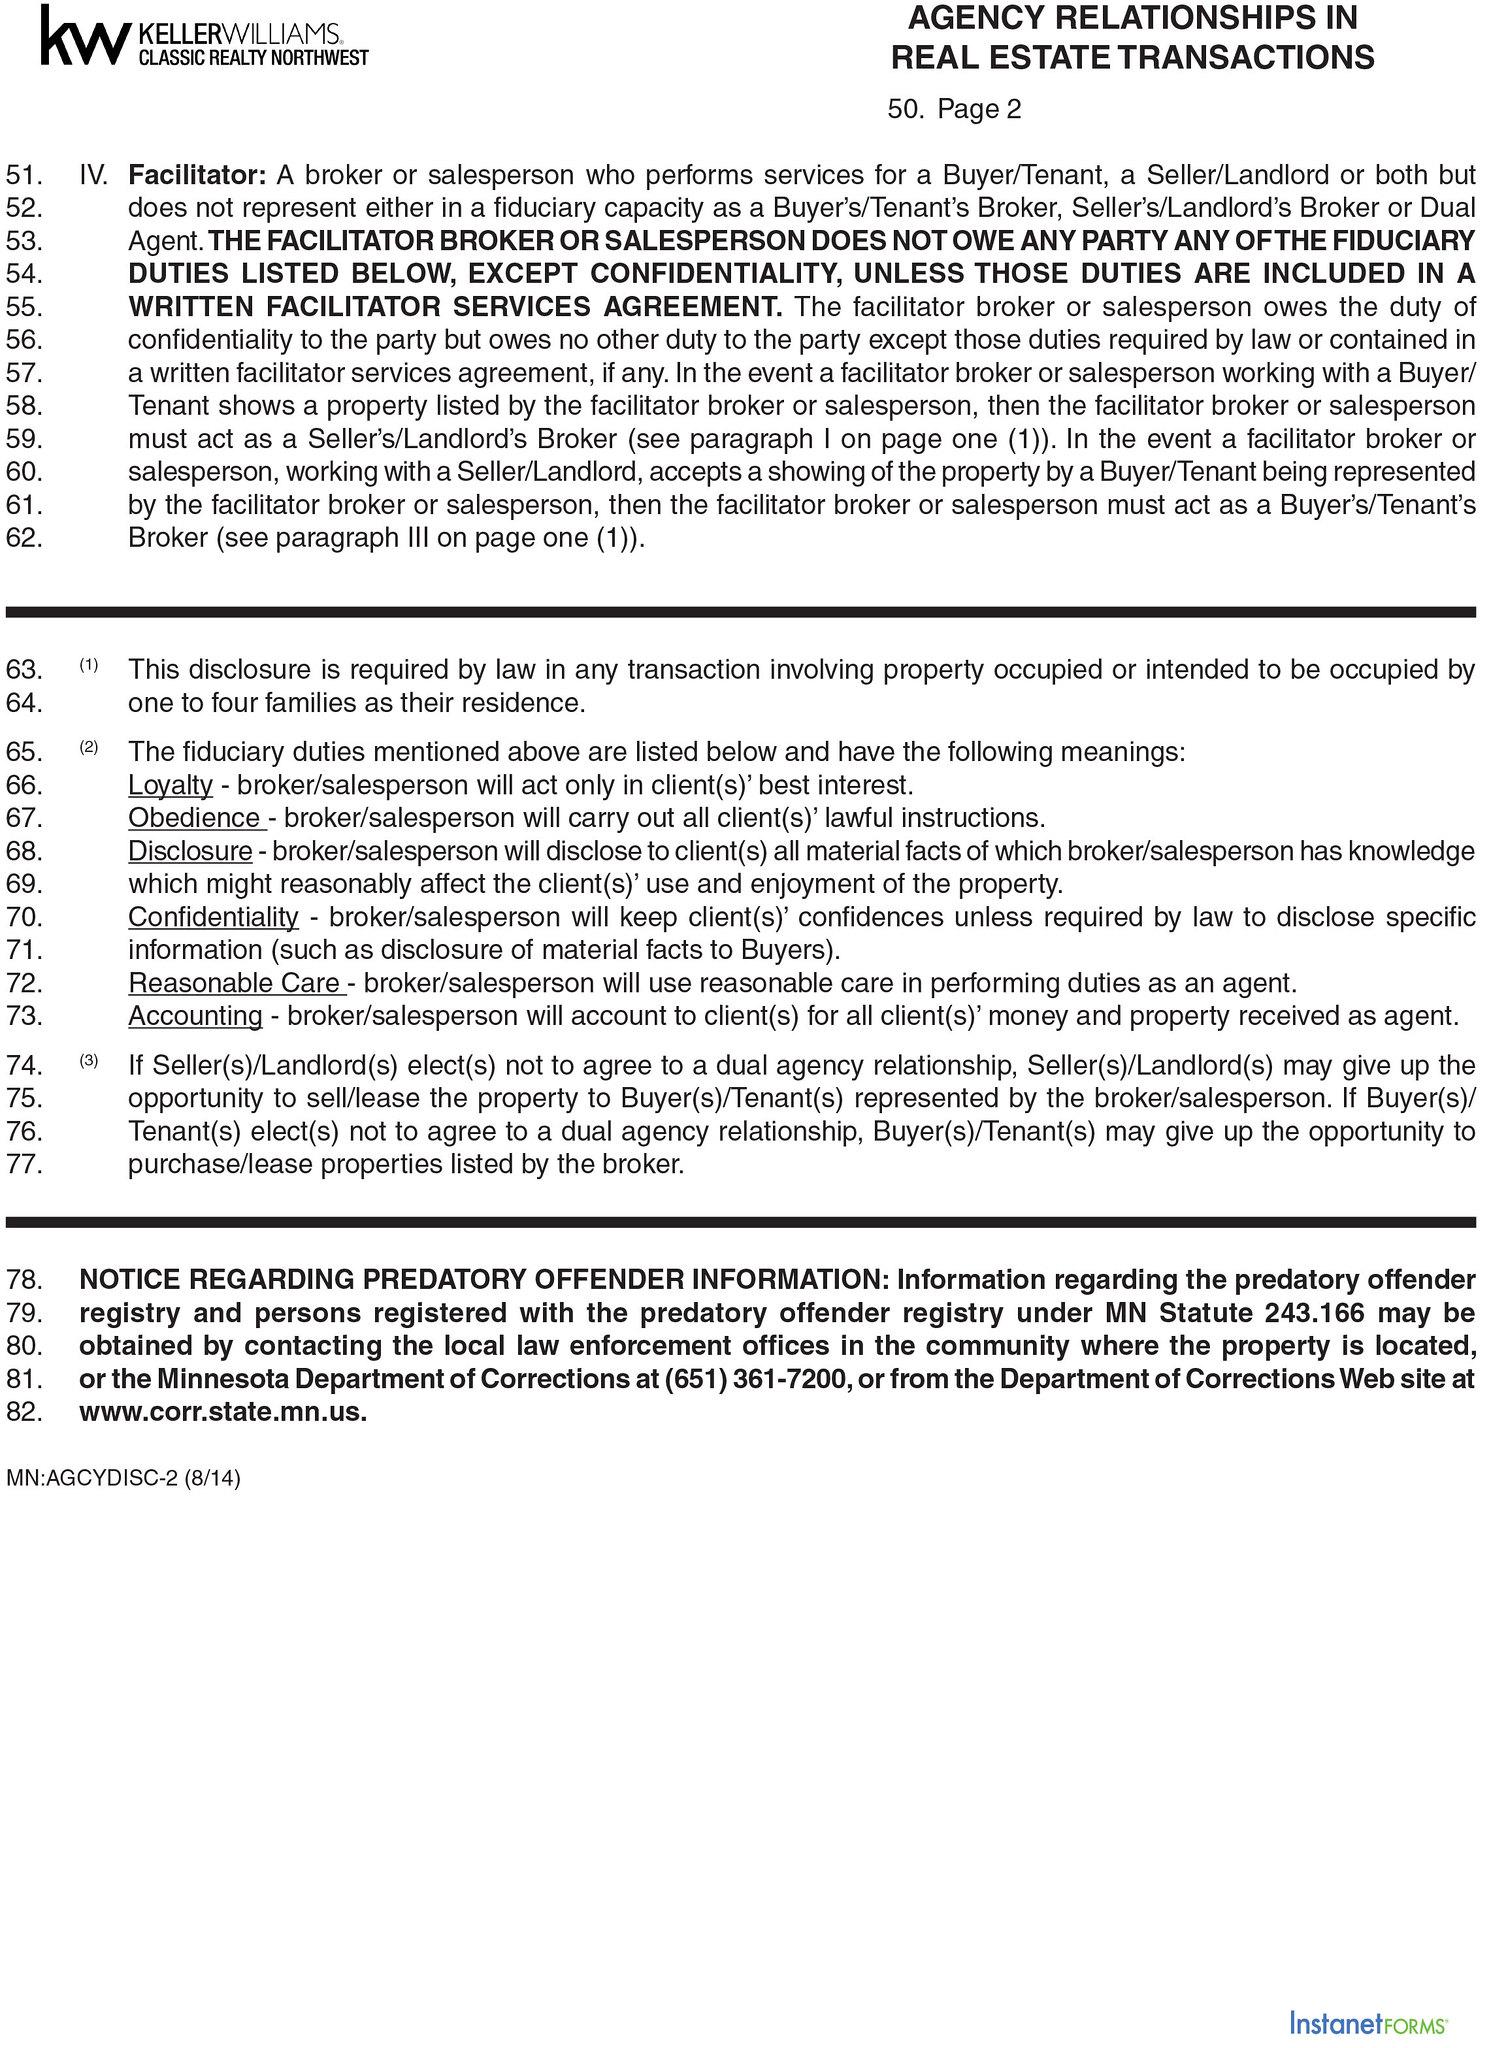 MNAR - Agency Relationships in Real Estate Transactions - 08 14.pdf